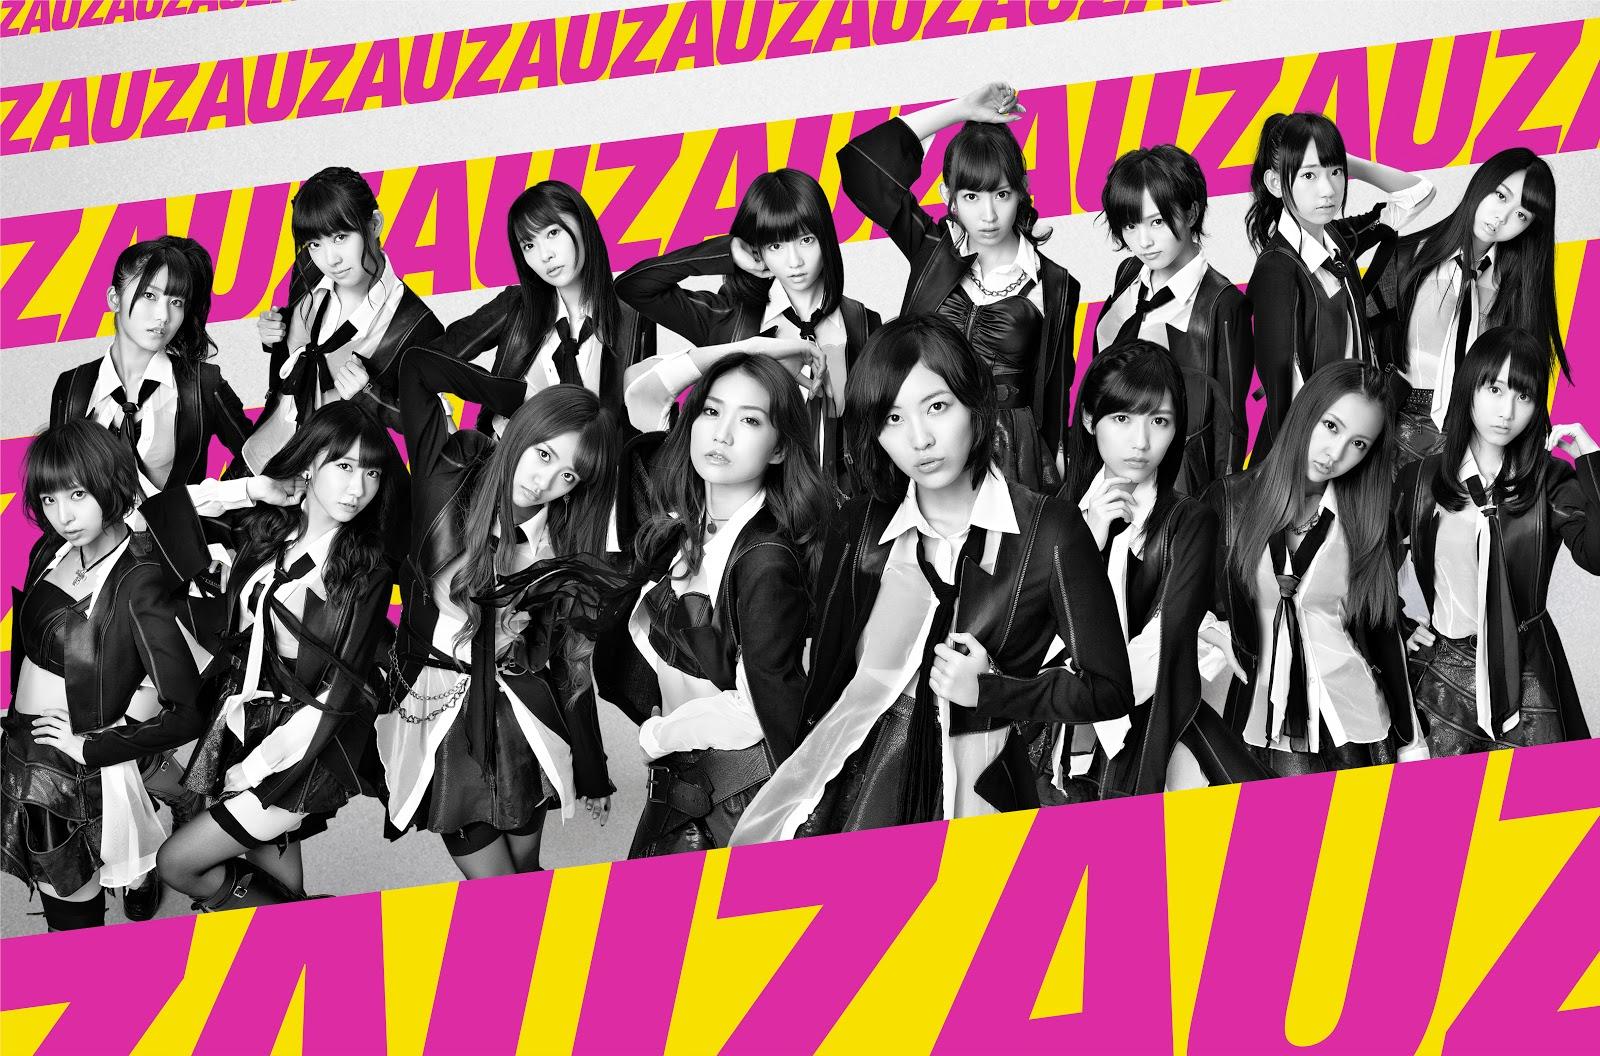 http://2.bp.blogspot.com/-OXCg8Z-TrRY/UJCcuiH81jI/AAAAAAAAOpc/BqXfw5k7_8Q/s1600/AKB48+UZA+Wallpaper.jpg